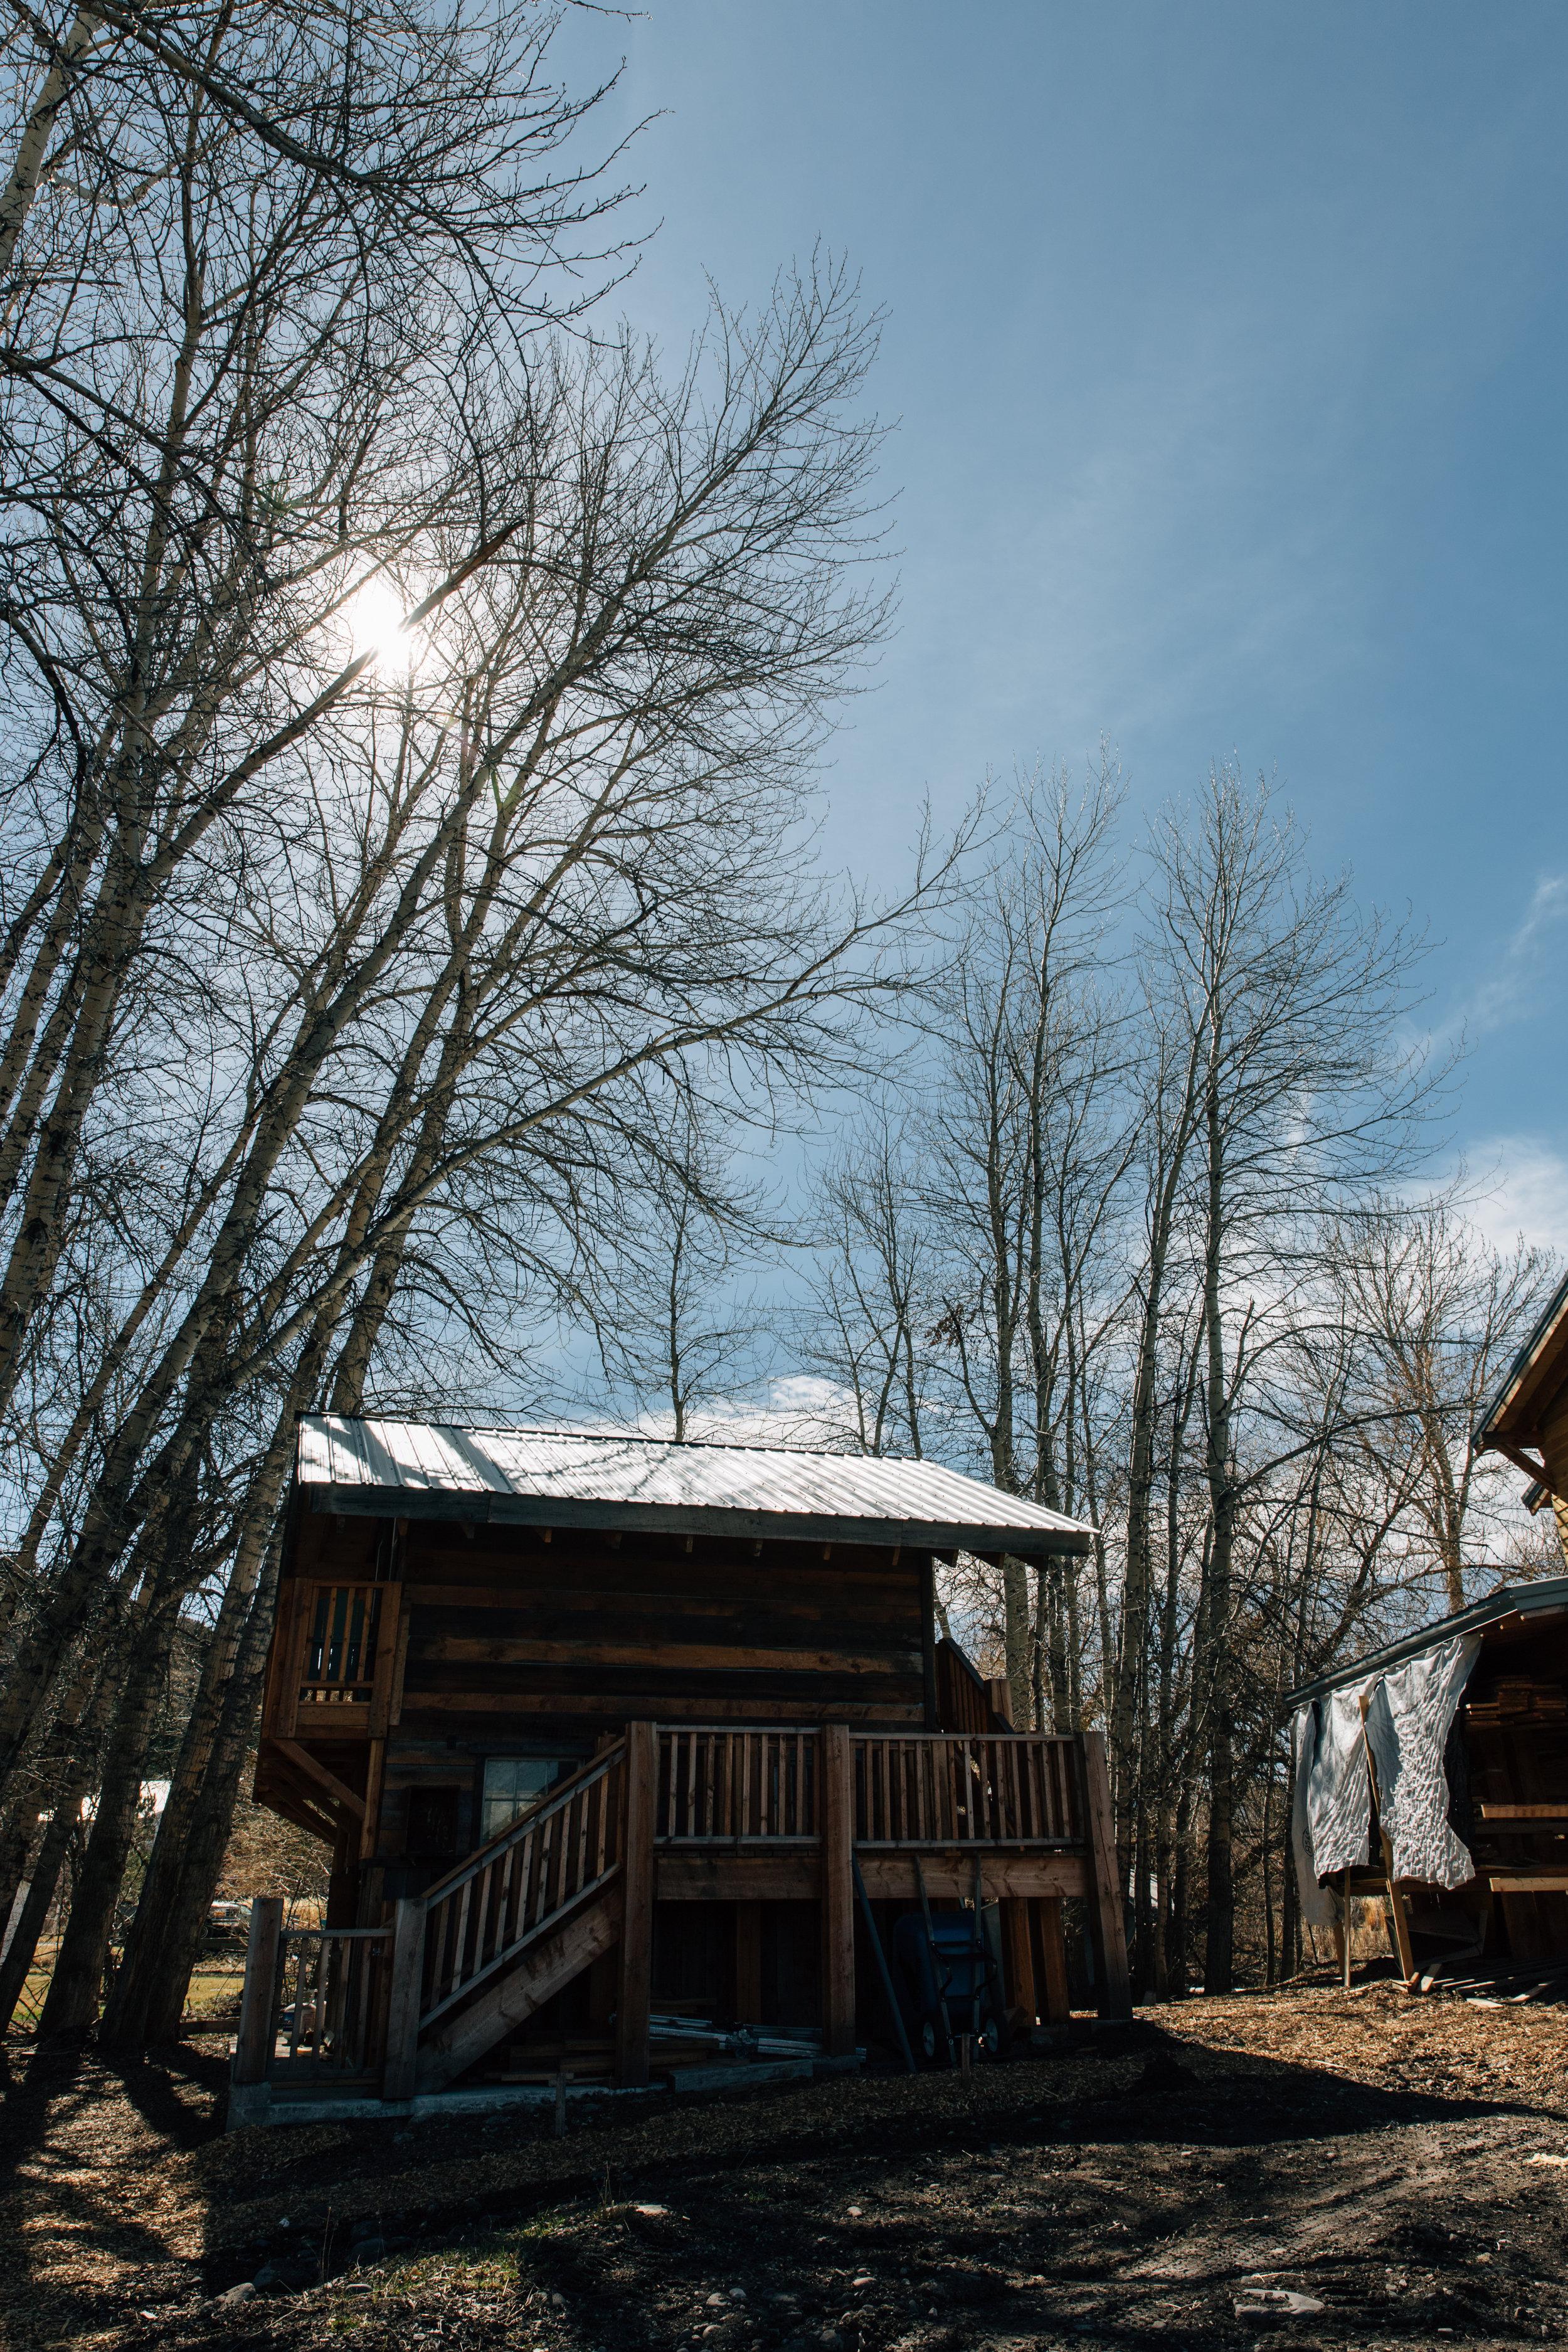 Montana_03_24_17-128-BLOG-FB.jpg